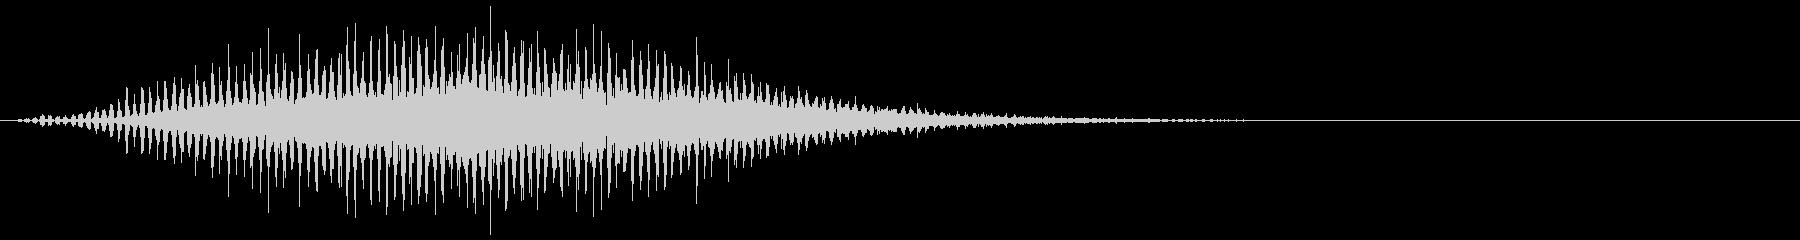 SF 移動音 32の未再生の波形